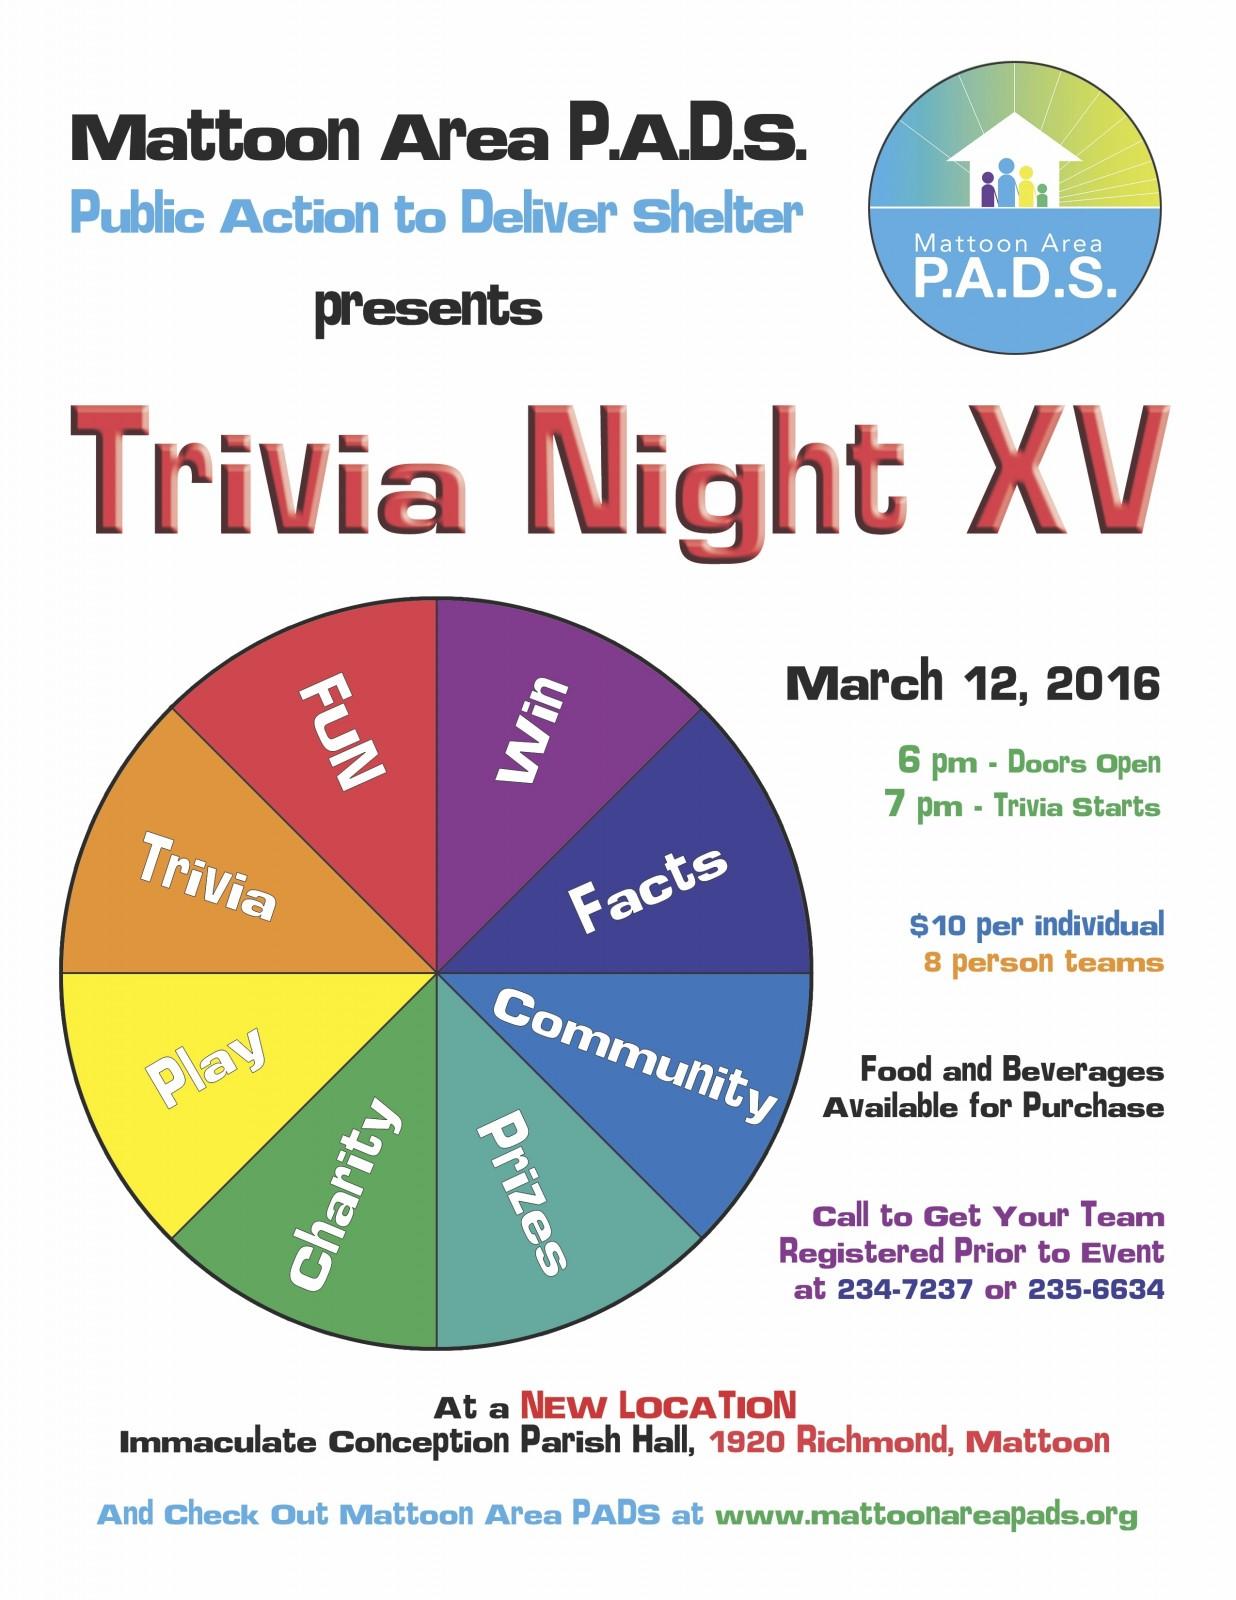 Trivia Night XV with Mattoon Area P.A.D.S.